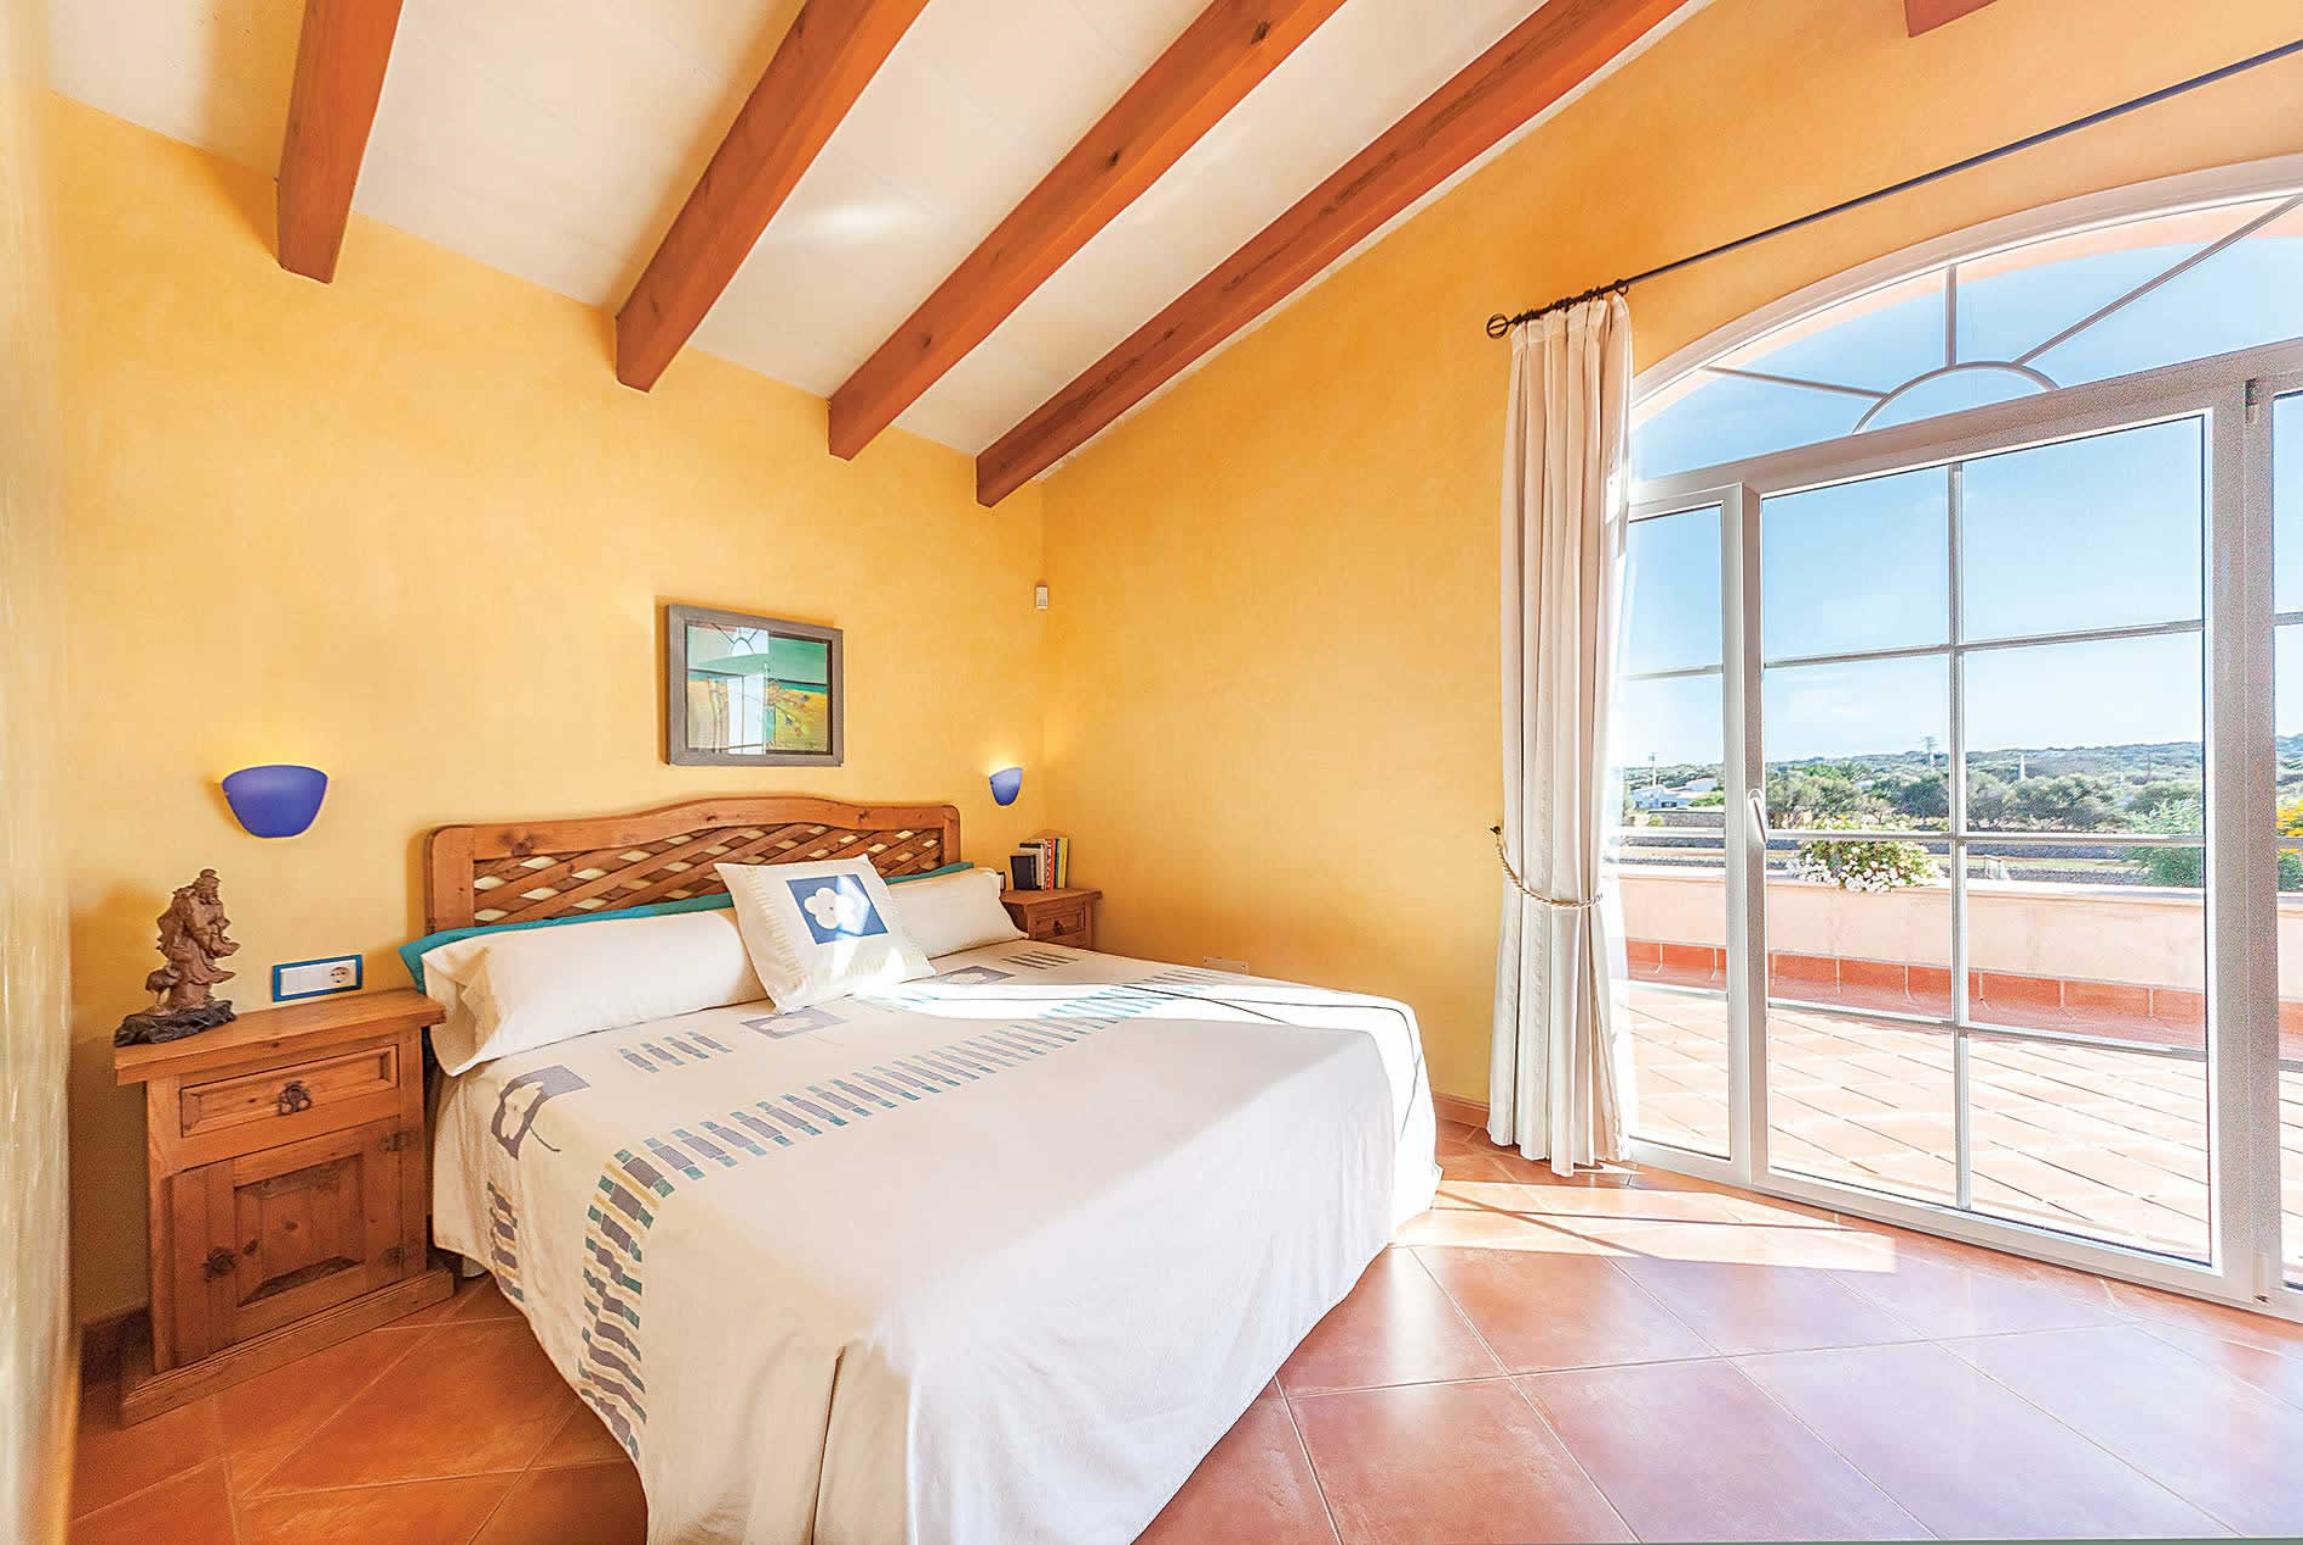 Ferienhaus Villa Estrellita (2649653), Punta Prima, Menorca, Balearische Inseln, Spanien, Bild 6